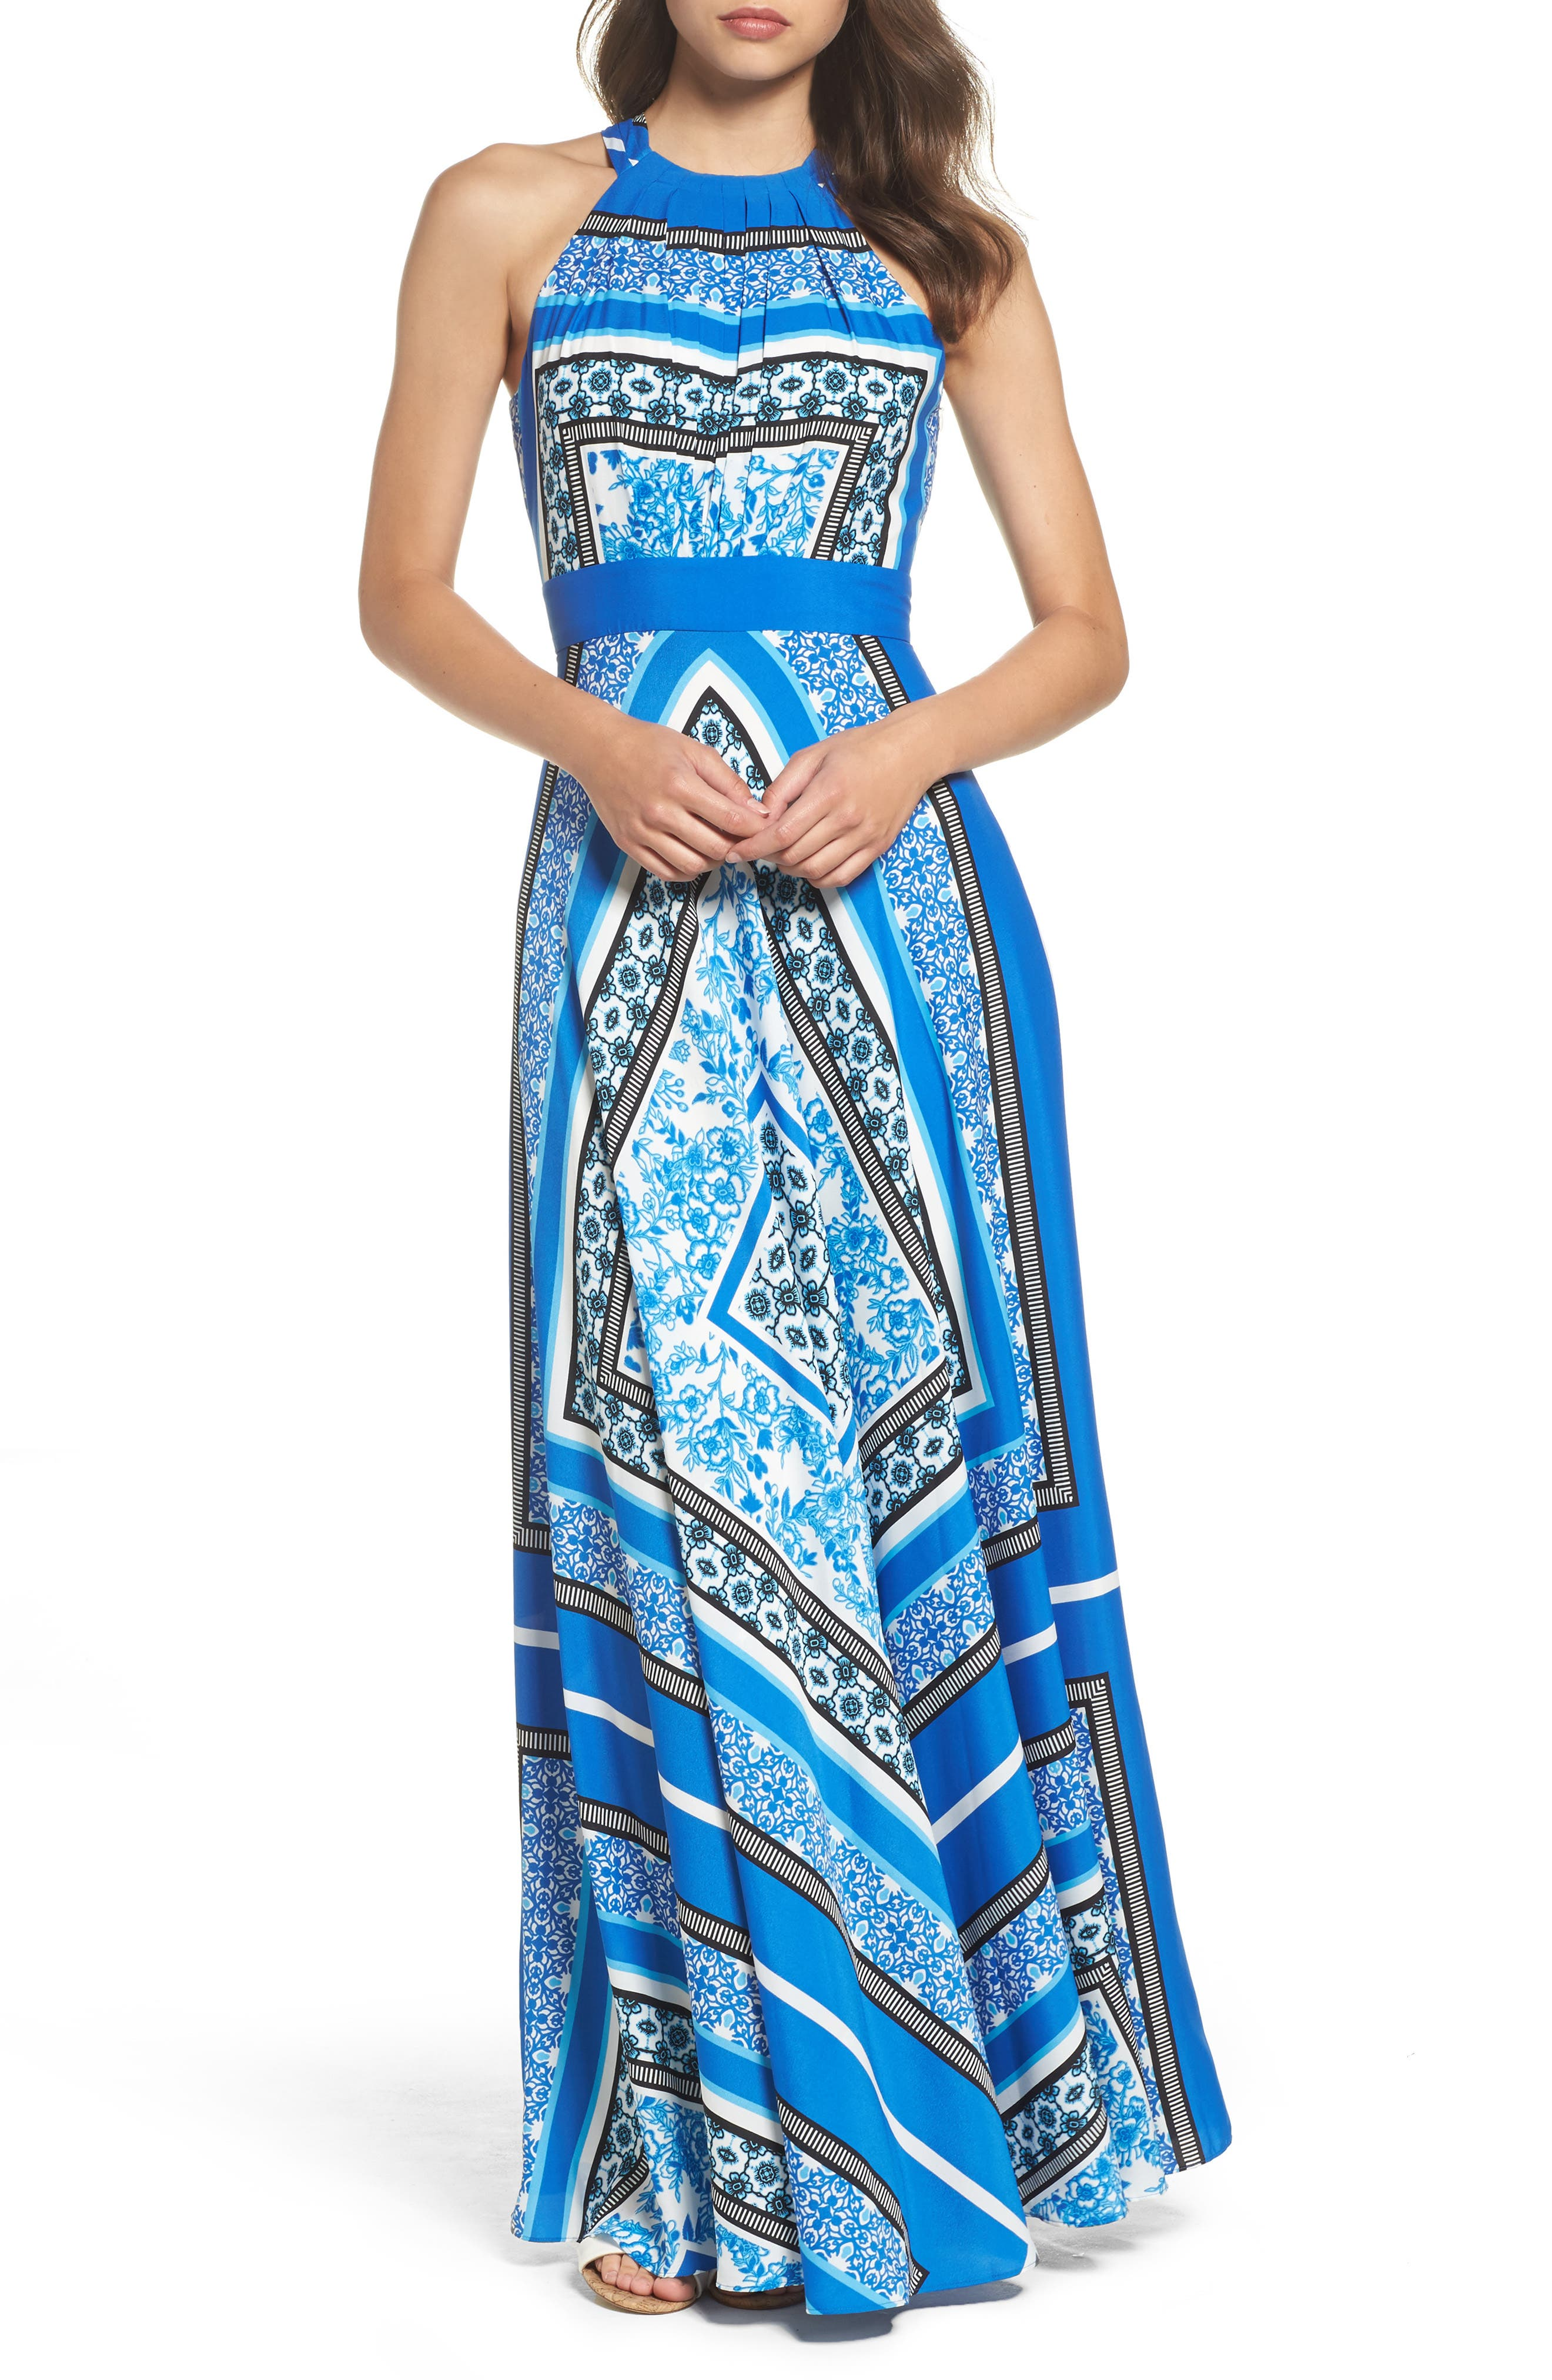 Alternate Image 1 Selected - Eliza J Scarf Print Halter Crêpe de Chine Maxi Dress (Regular & Petite)